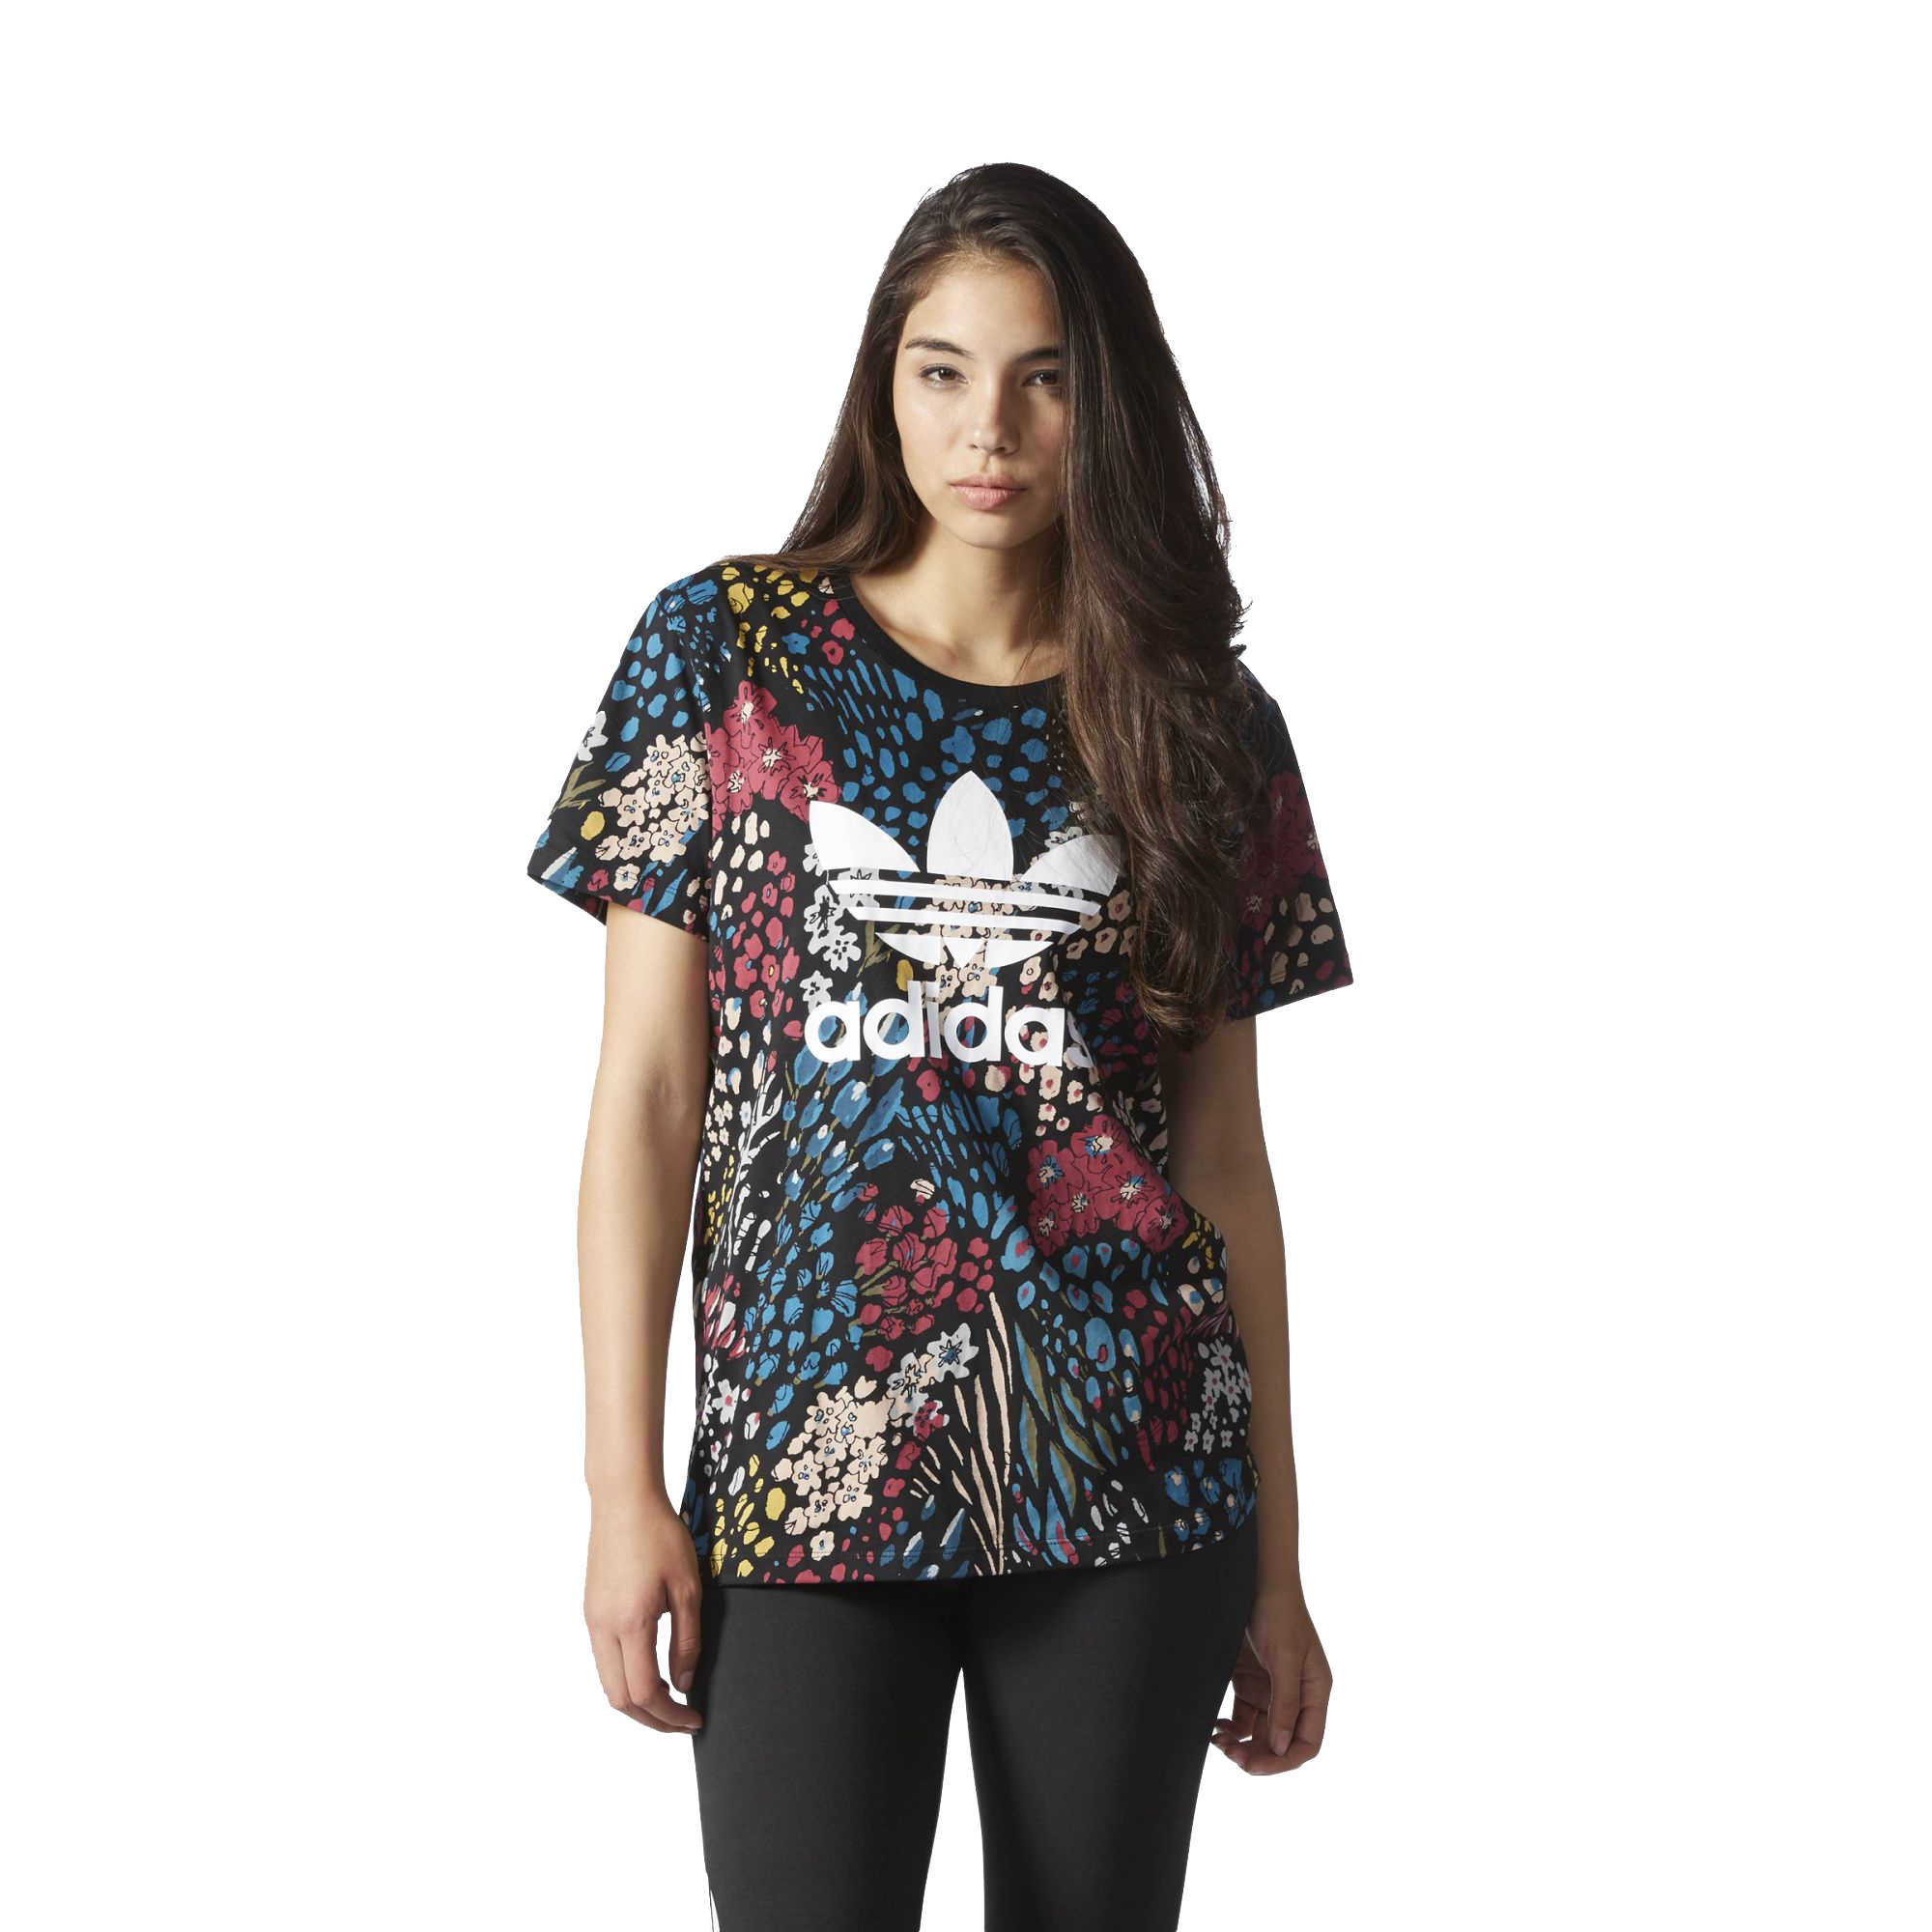 capoc Ritual principalmente  camiseta adidas flores hombre baratas online